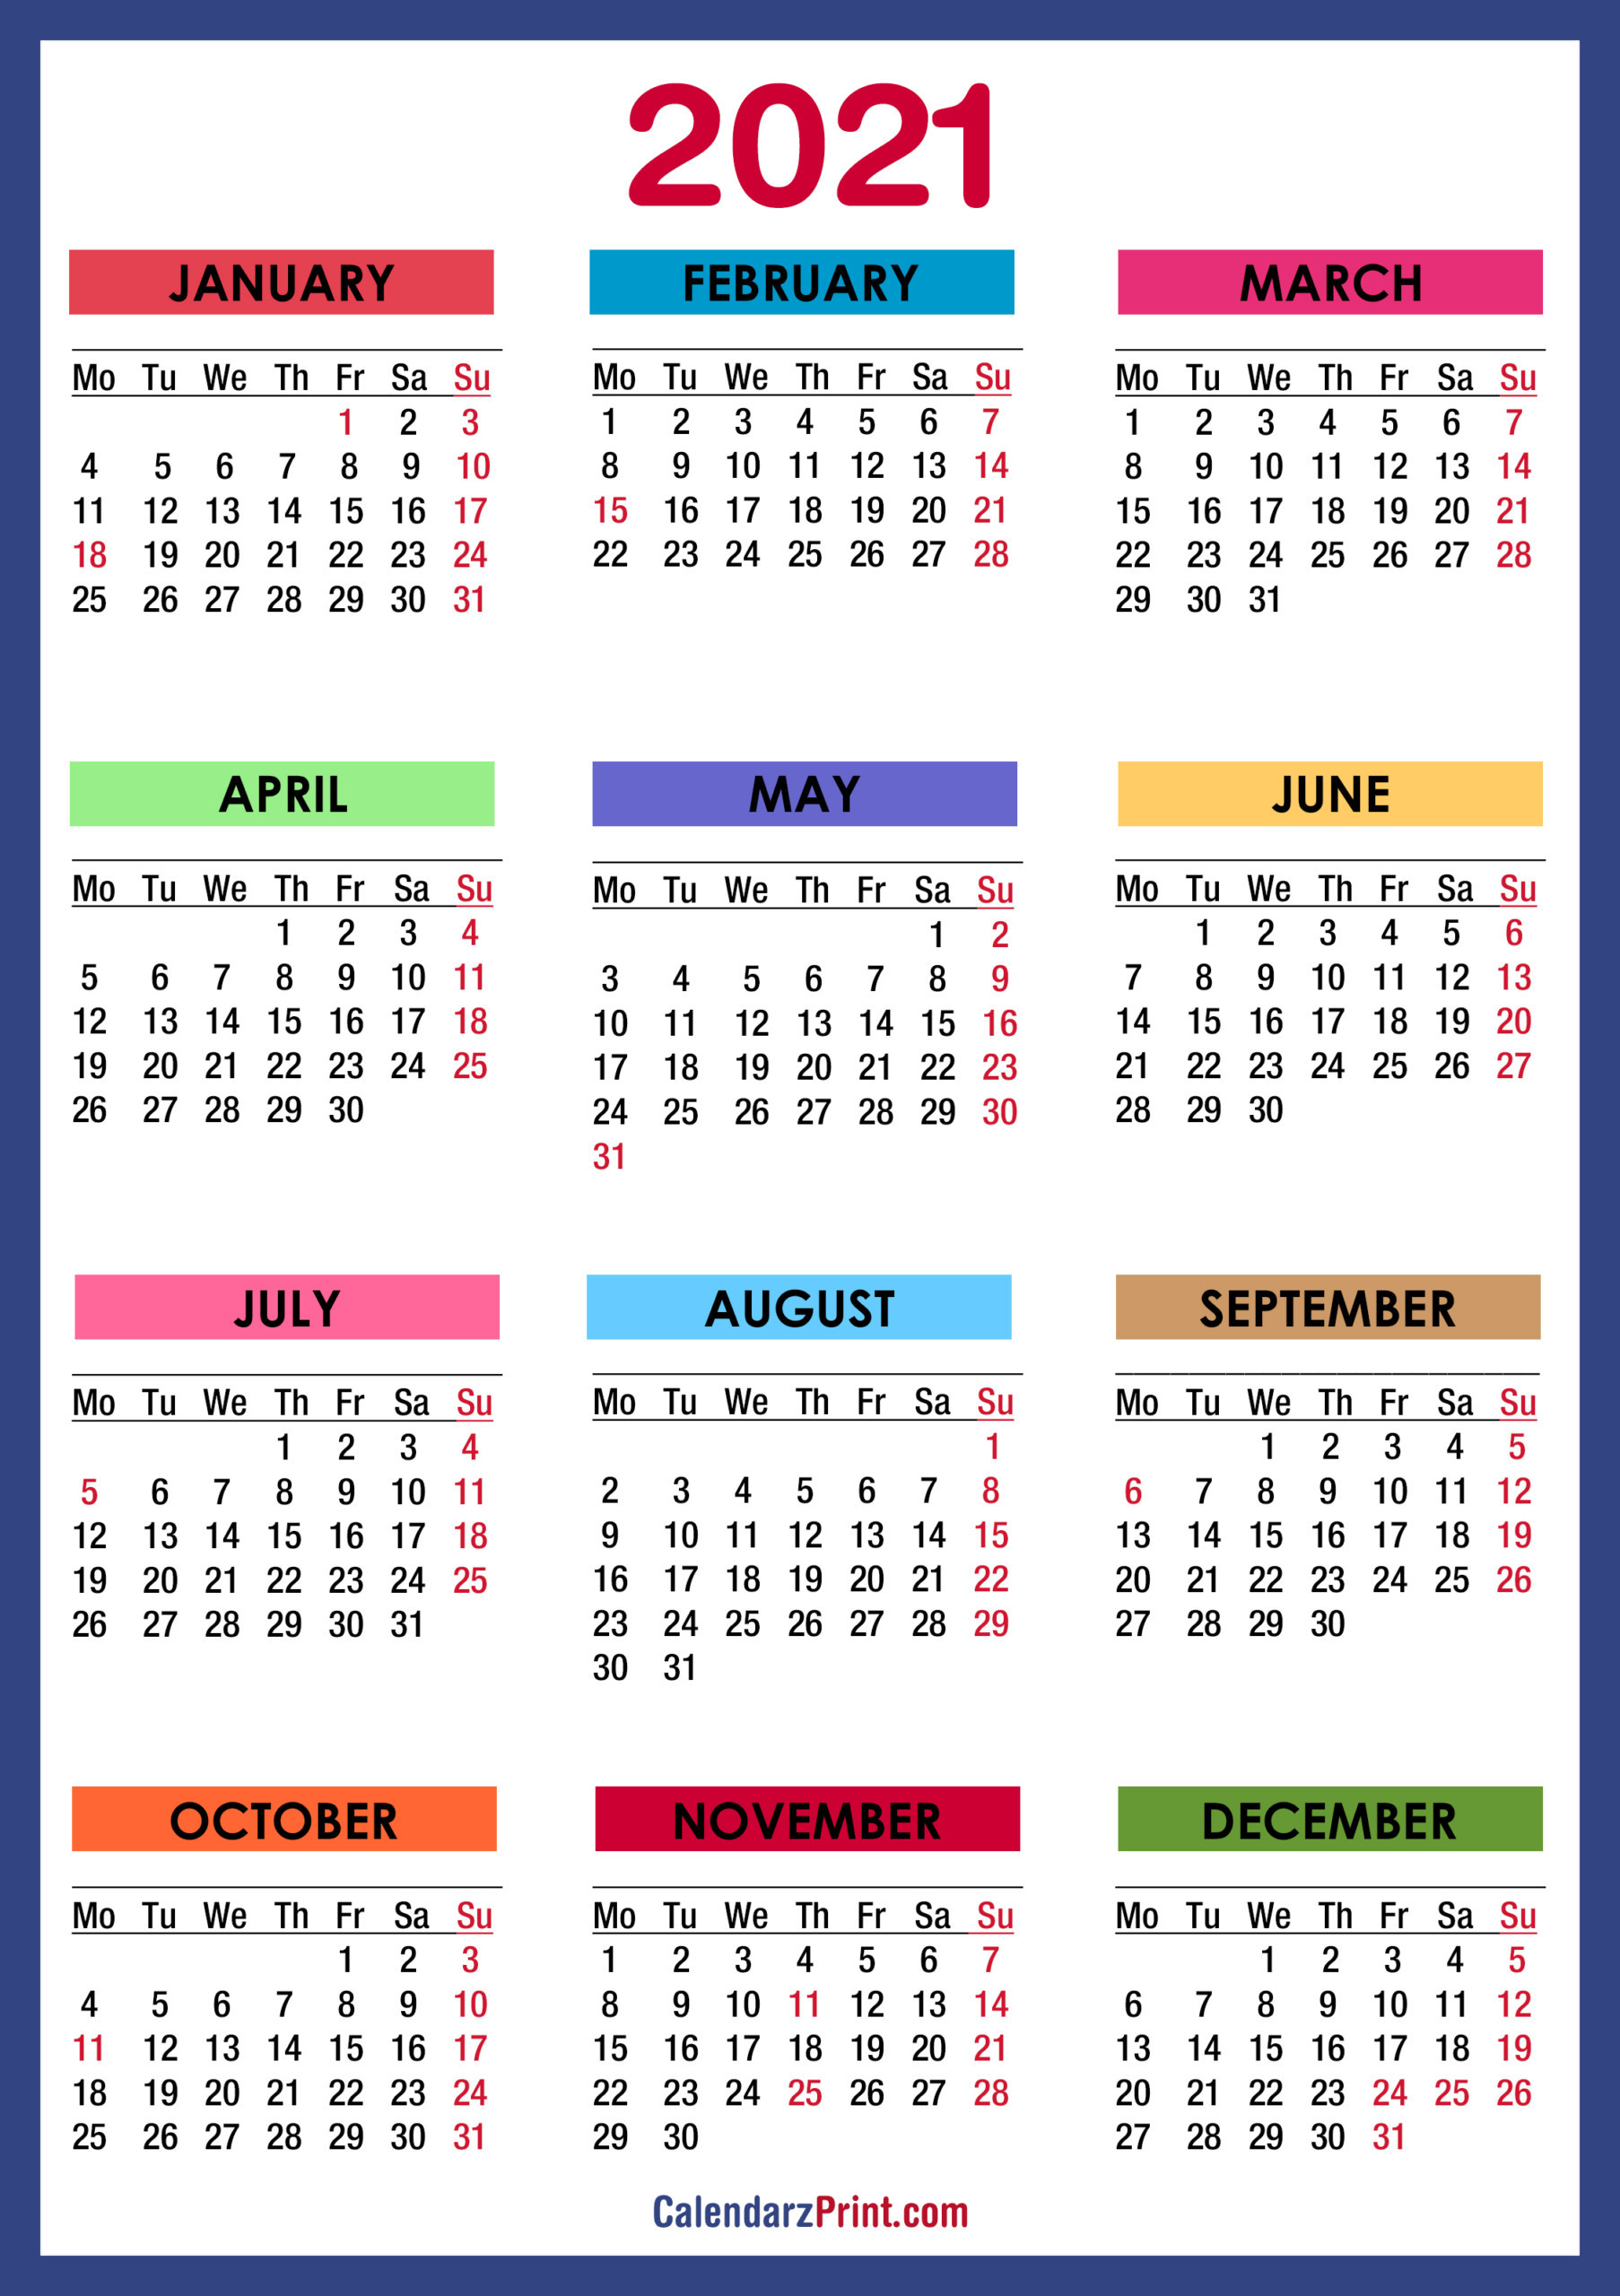 2021 Calendar With Us Holidays Printable Pdf   2021-2021 Monthly Calendar Printable Pdf